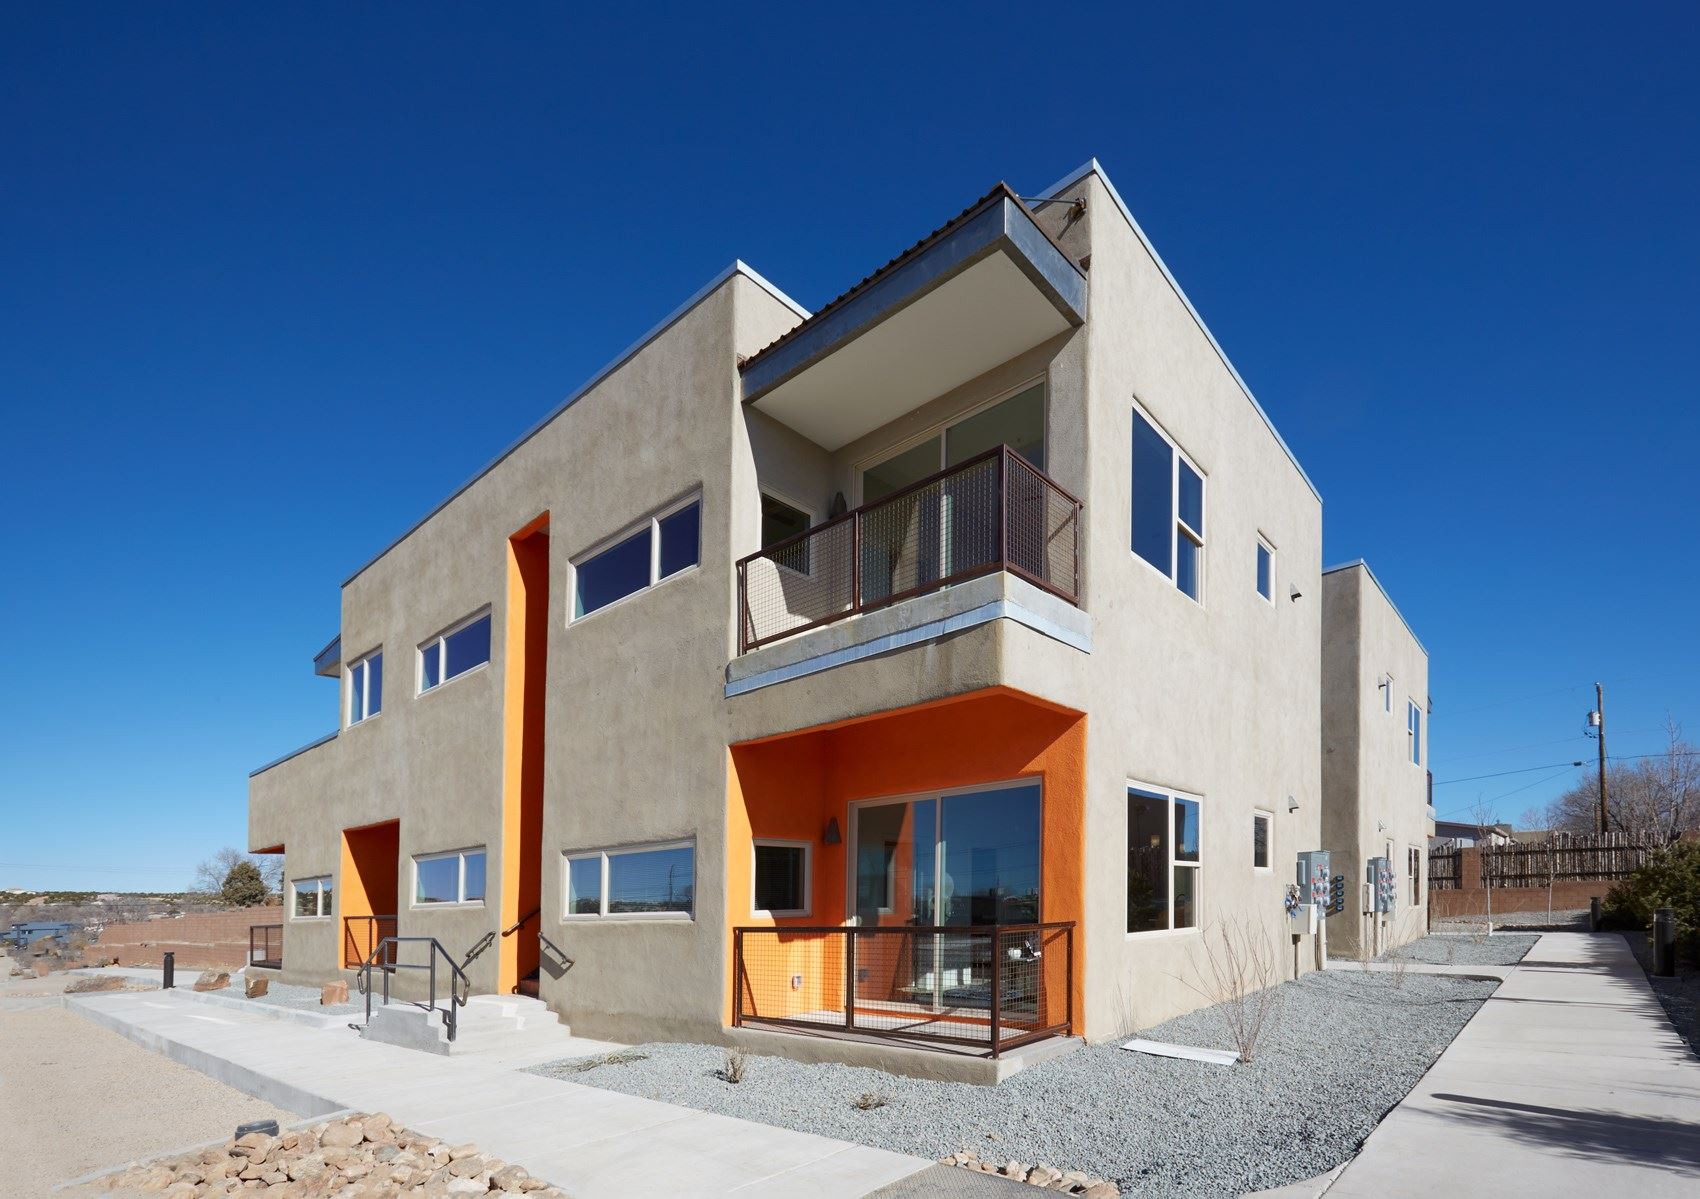 1113 Paseo Corazon #Unit 111, Santa Fe, NM 87507 - #: 202000349